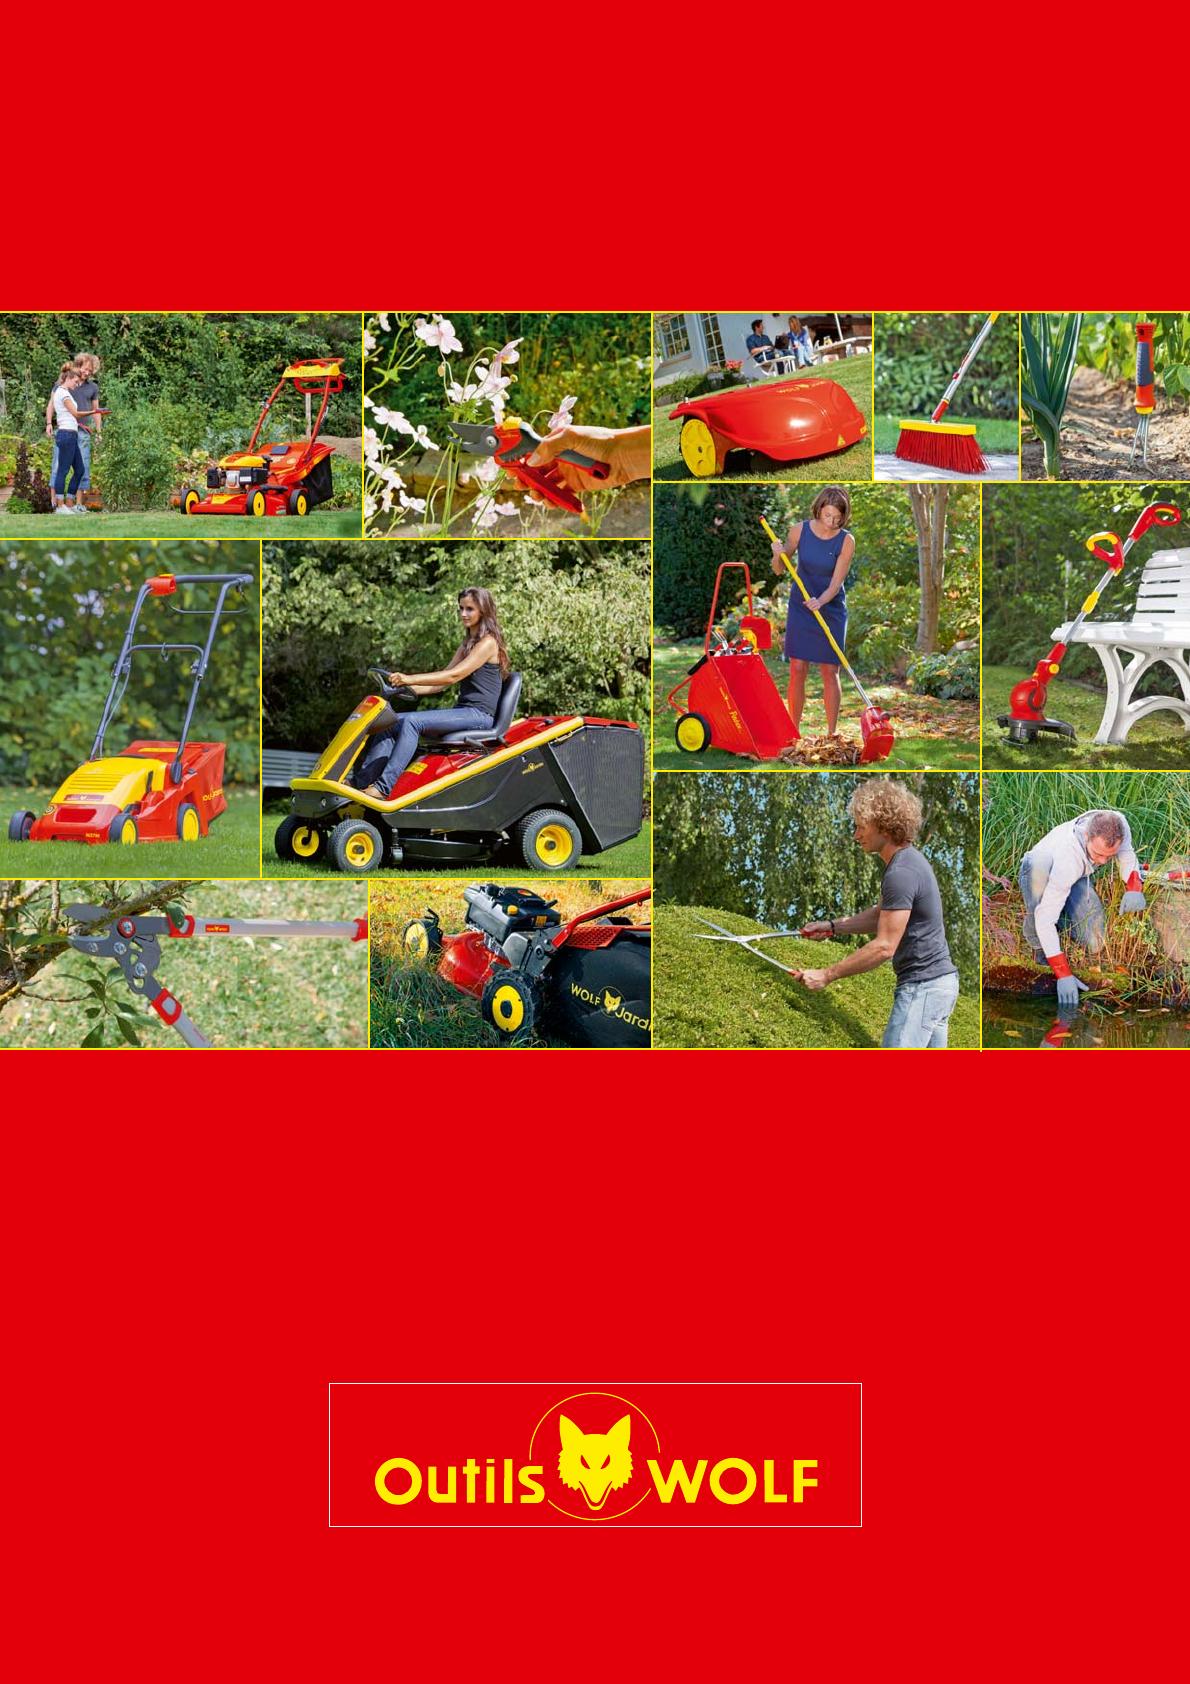 Catalogo Outils Wolf Jardin 2014 destiné Outil Wolf Jardin